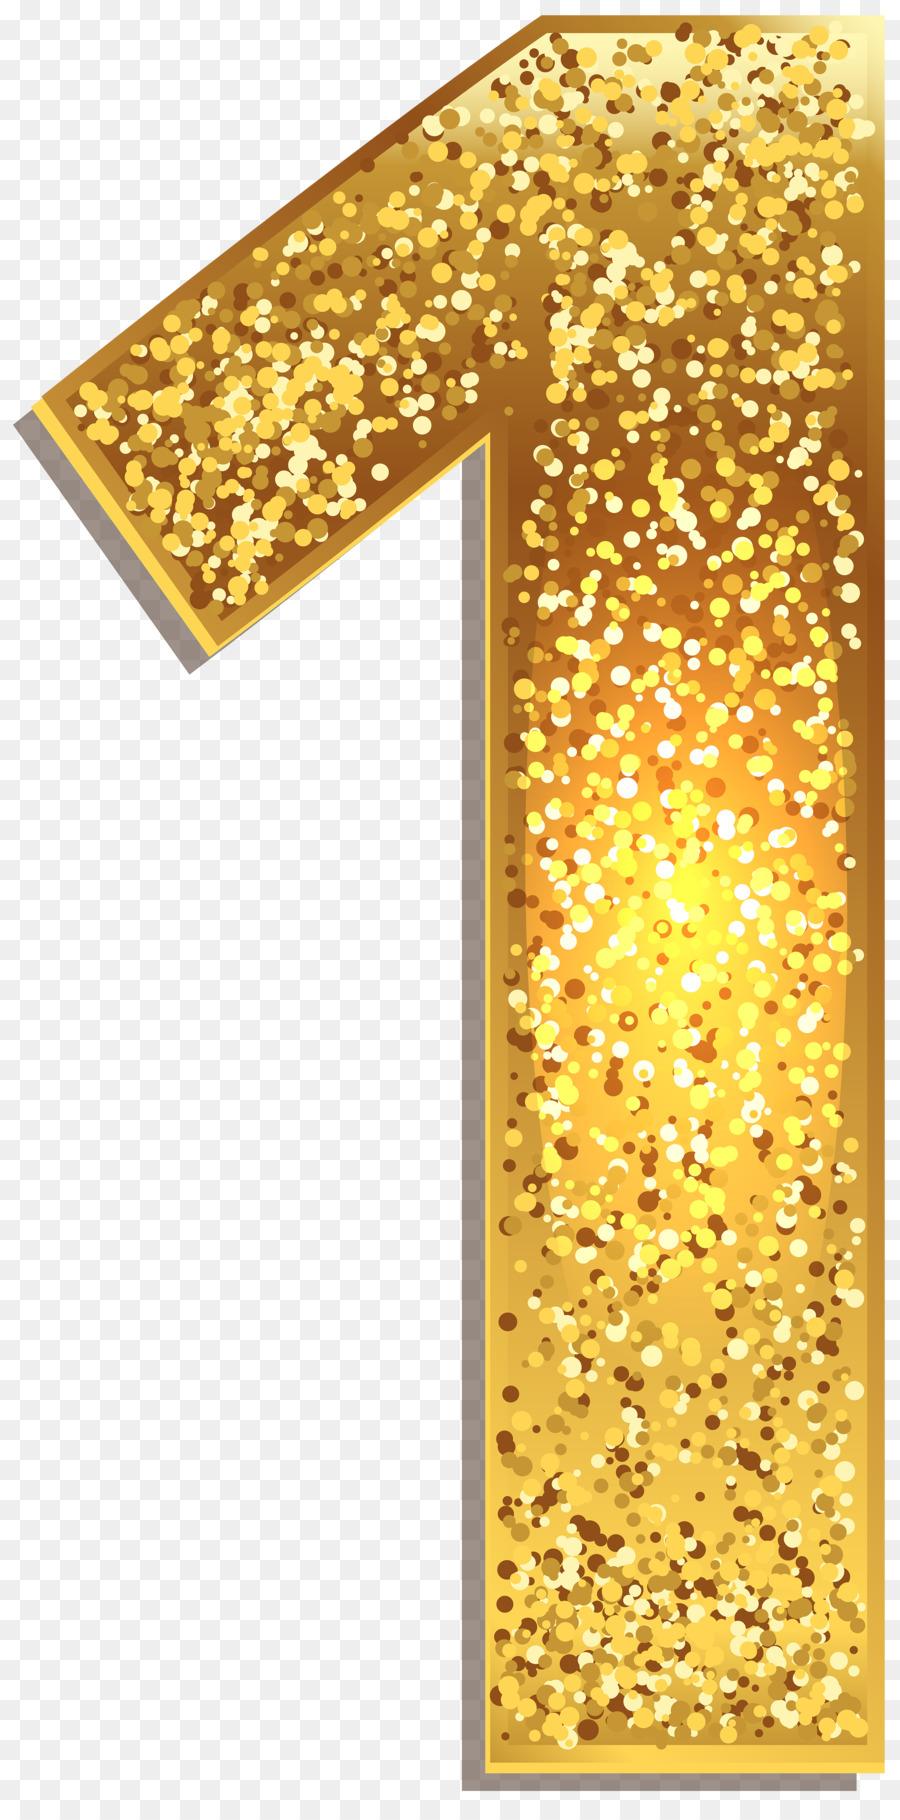 number gold clip art - number one png download - 2494 5000